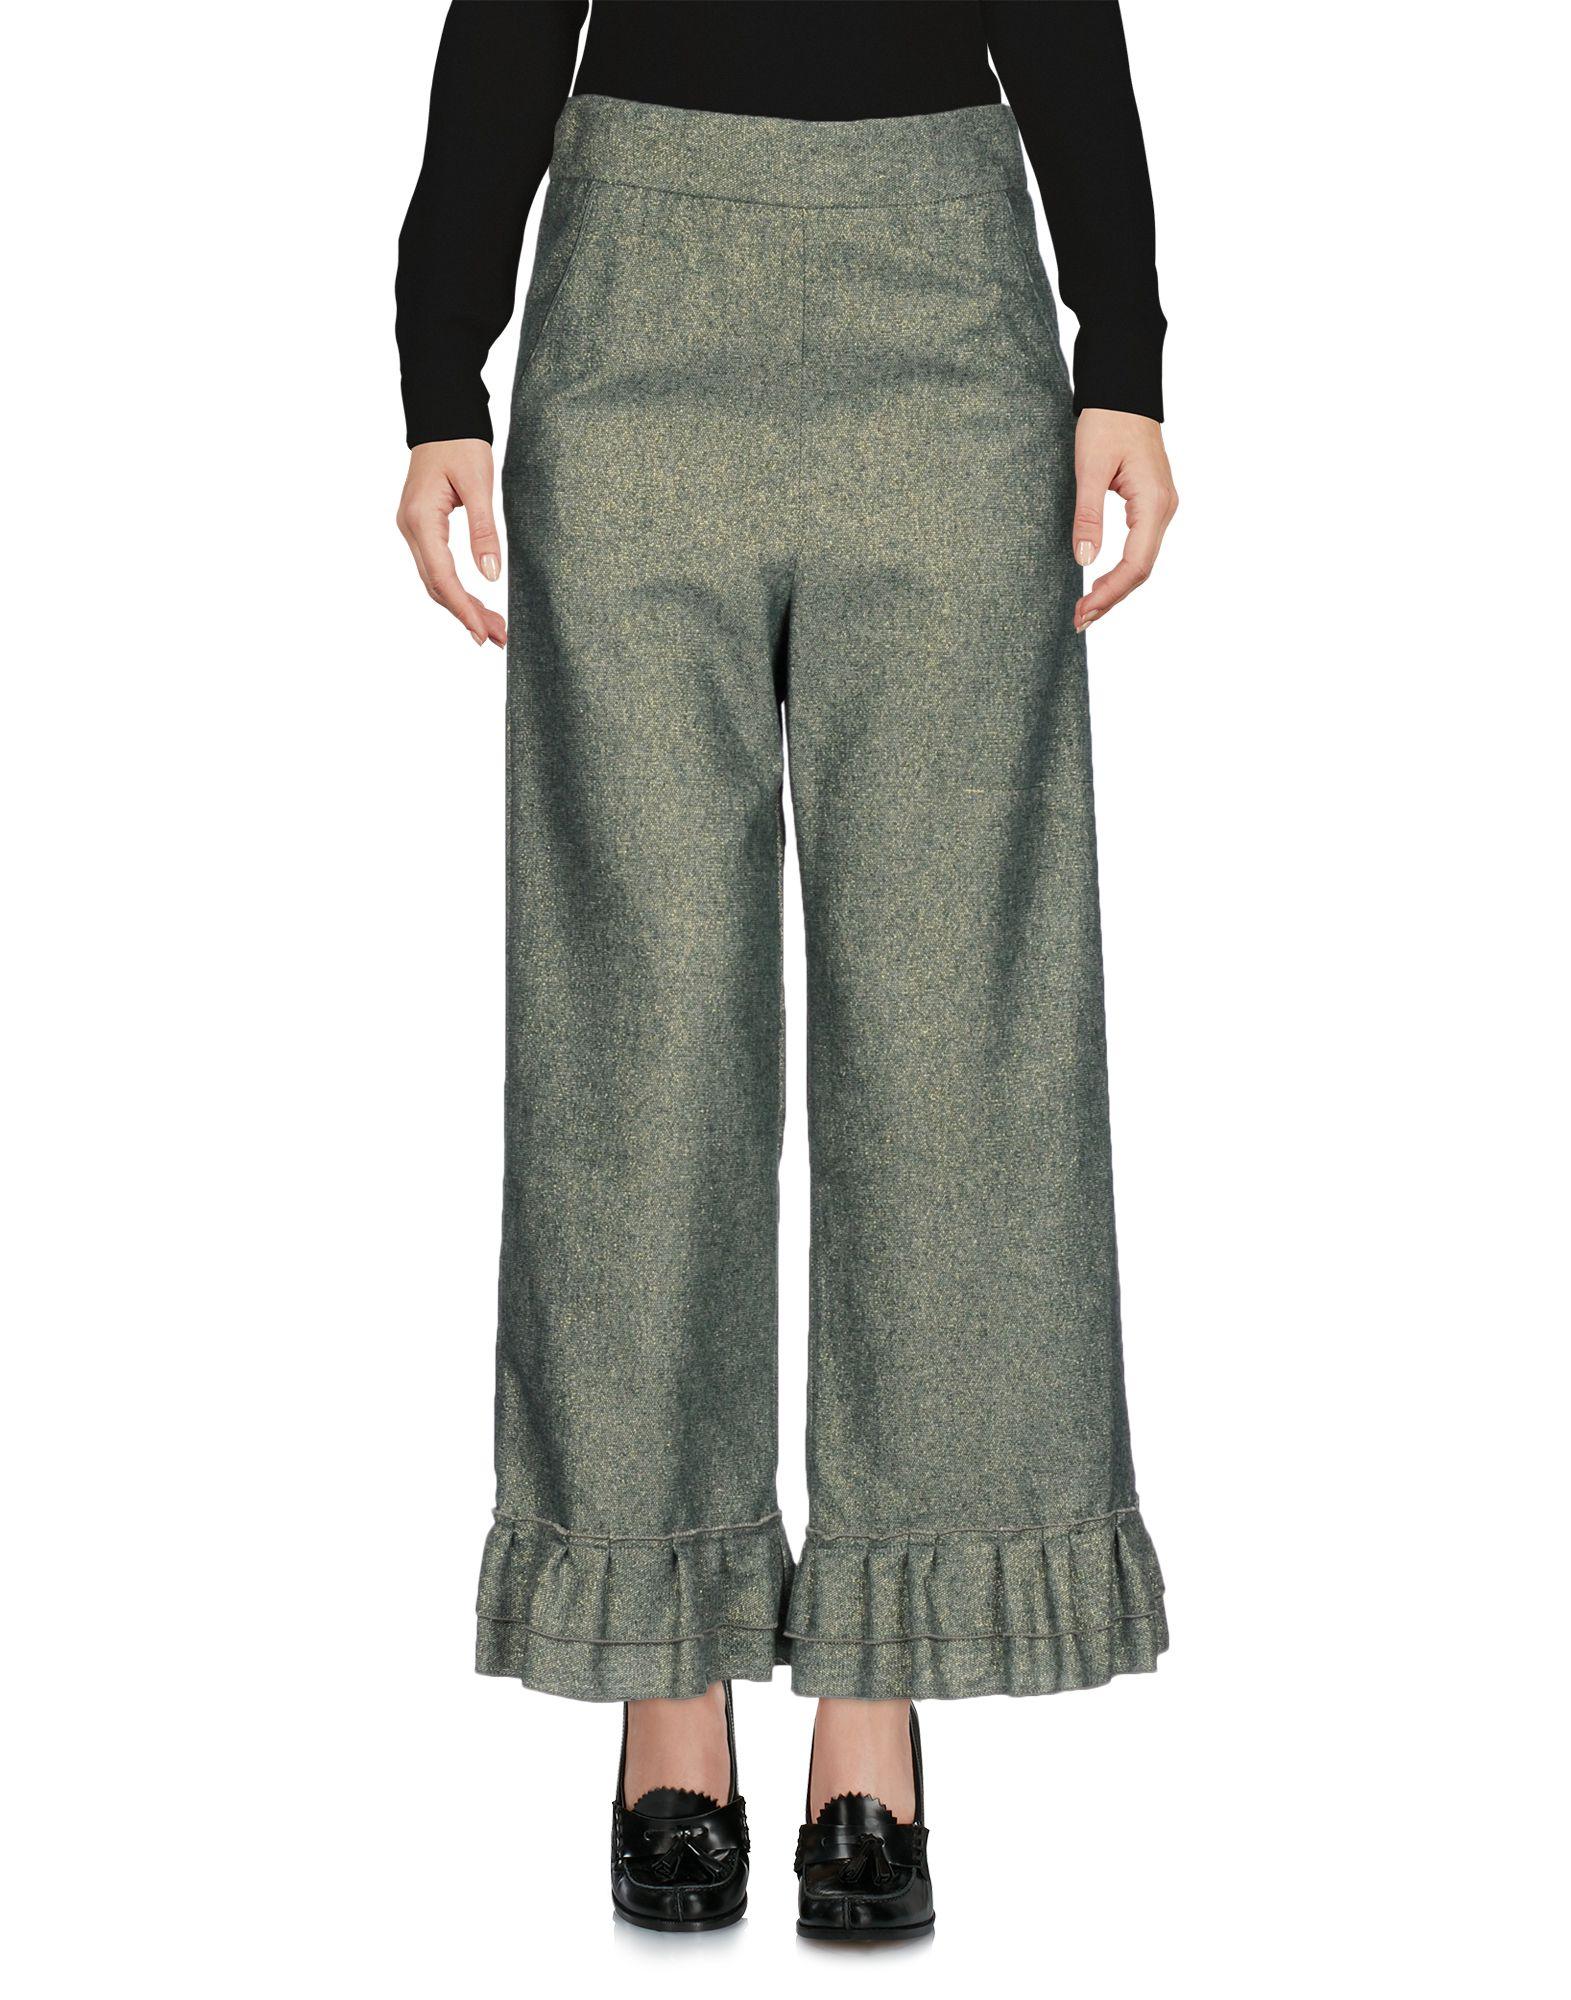 CRILLA NANÀ Повседневные брюки silver 3 5 inches usb 2 0 ide hard disk hdd enclosure cartridge case